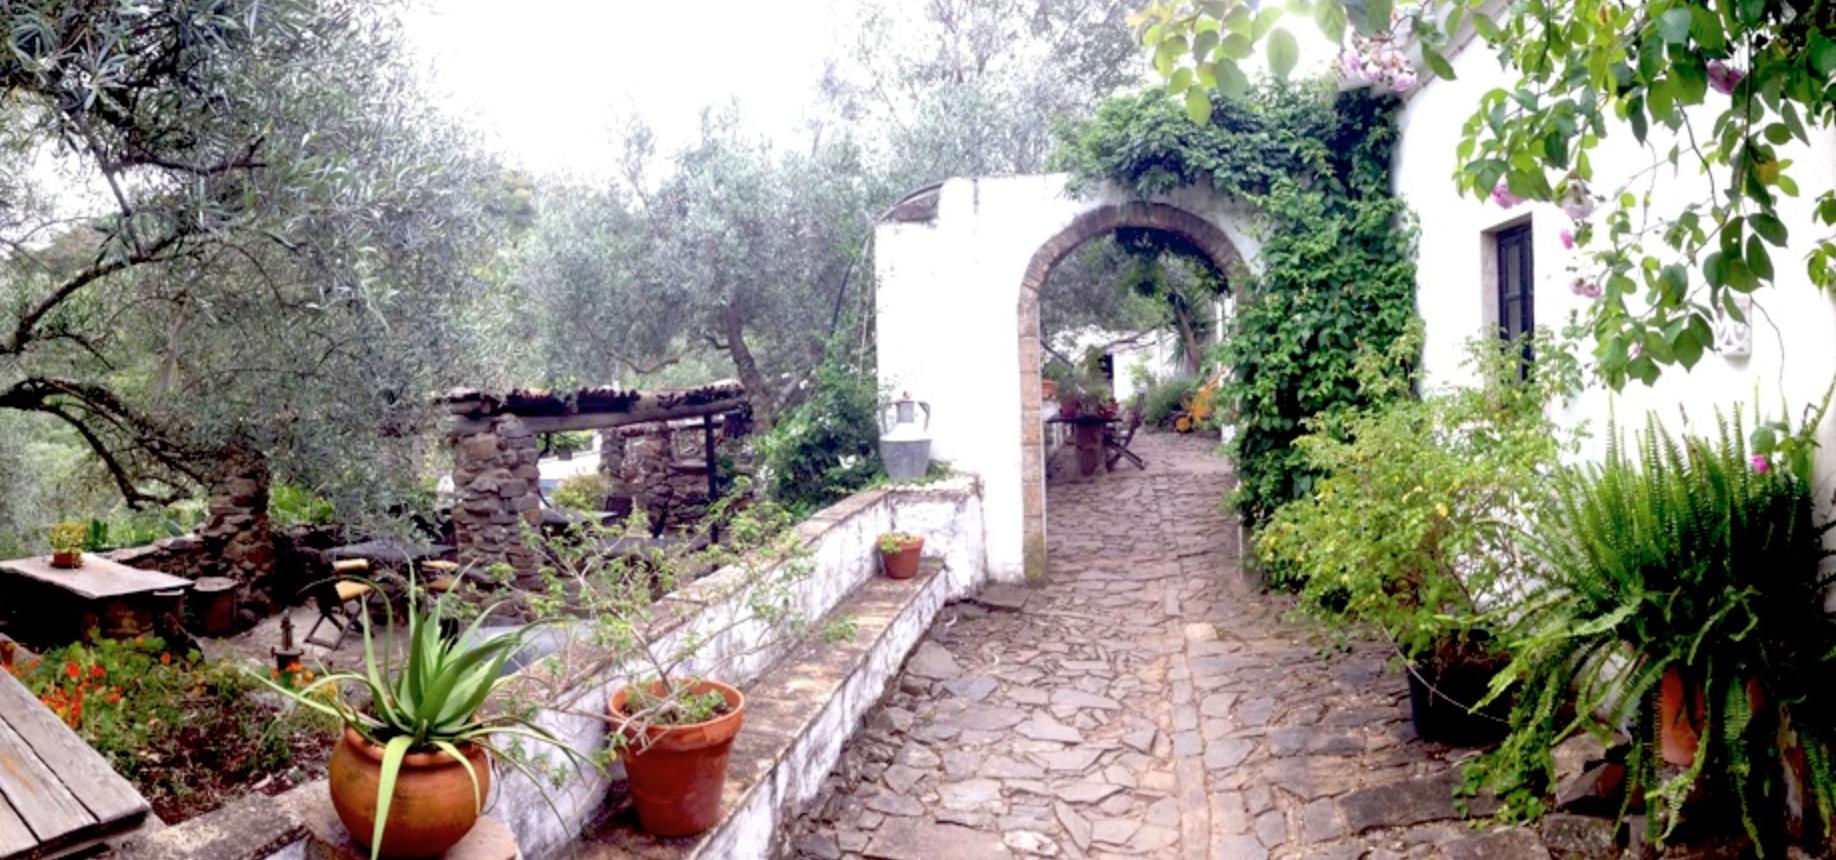 Image property of Quinta do Caracao